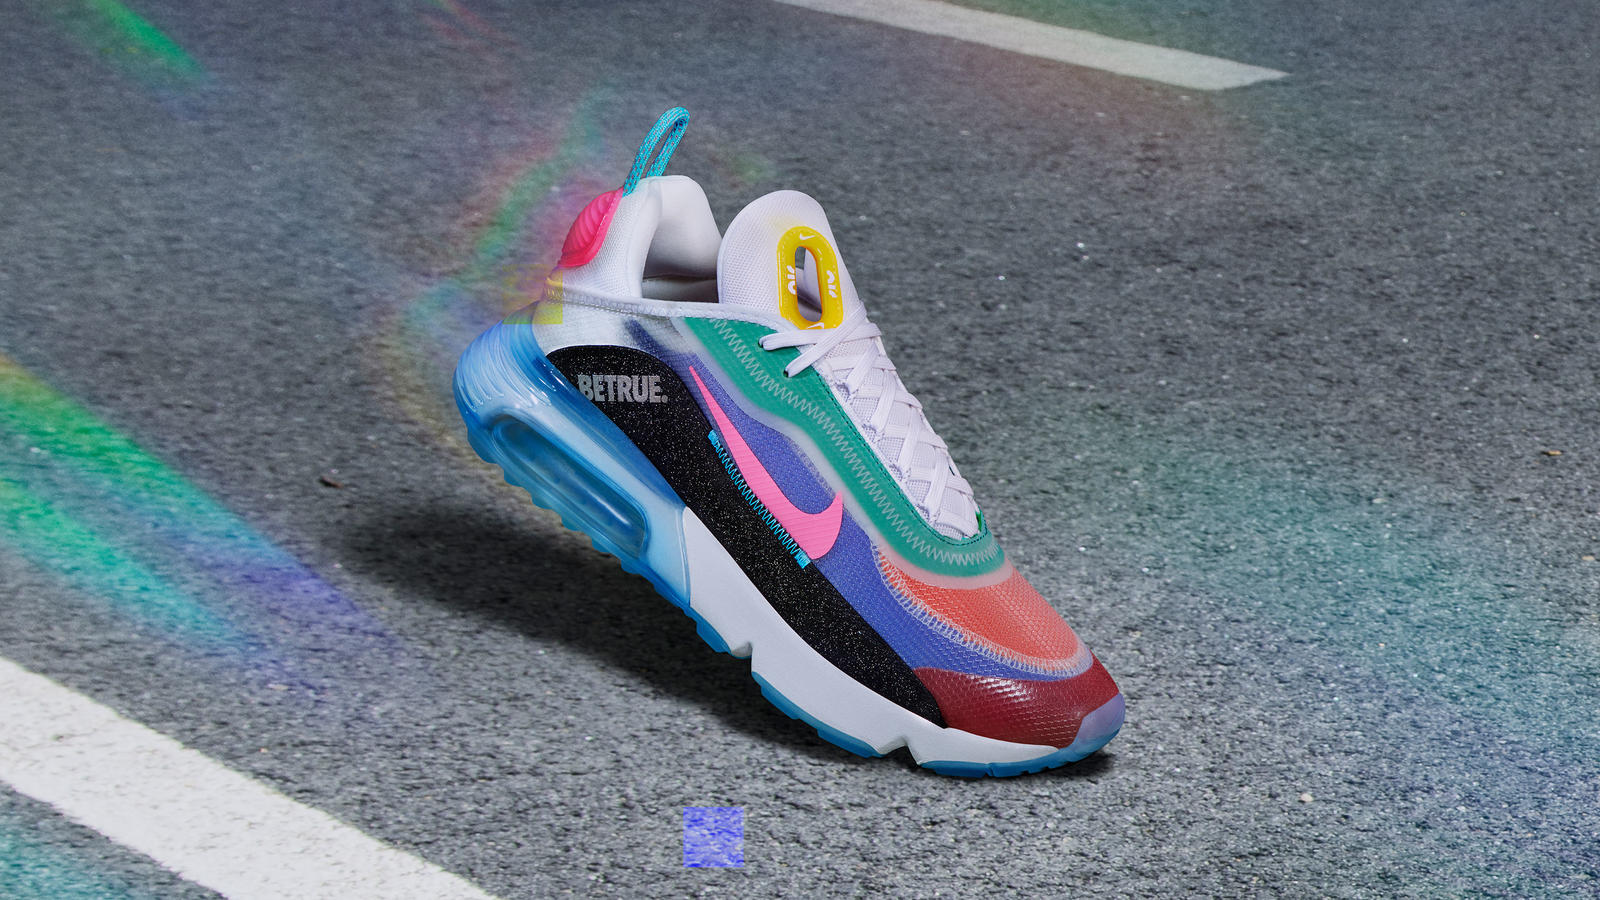 Nike BETRUE and Converse Pride 2020